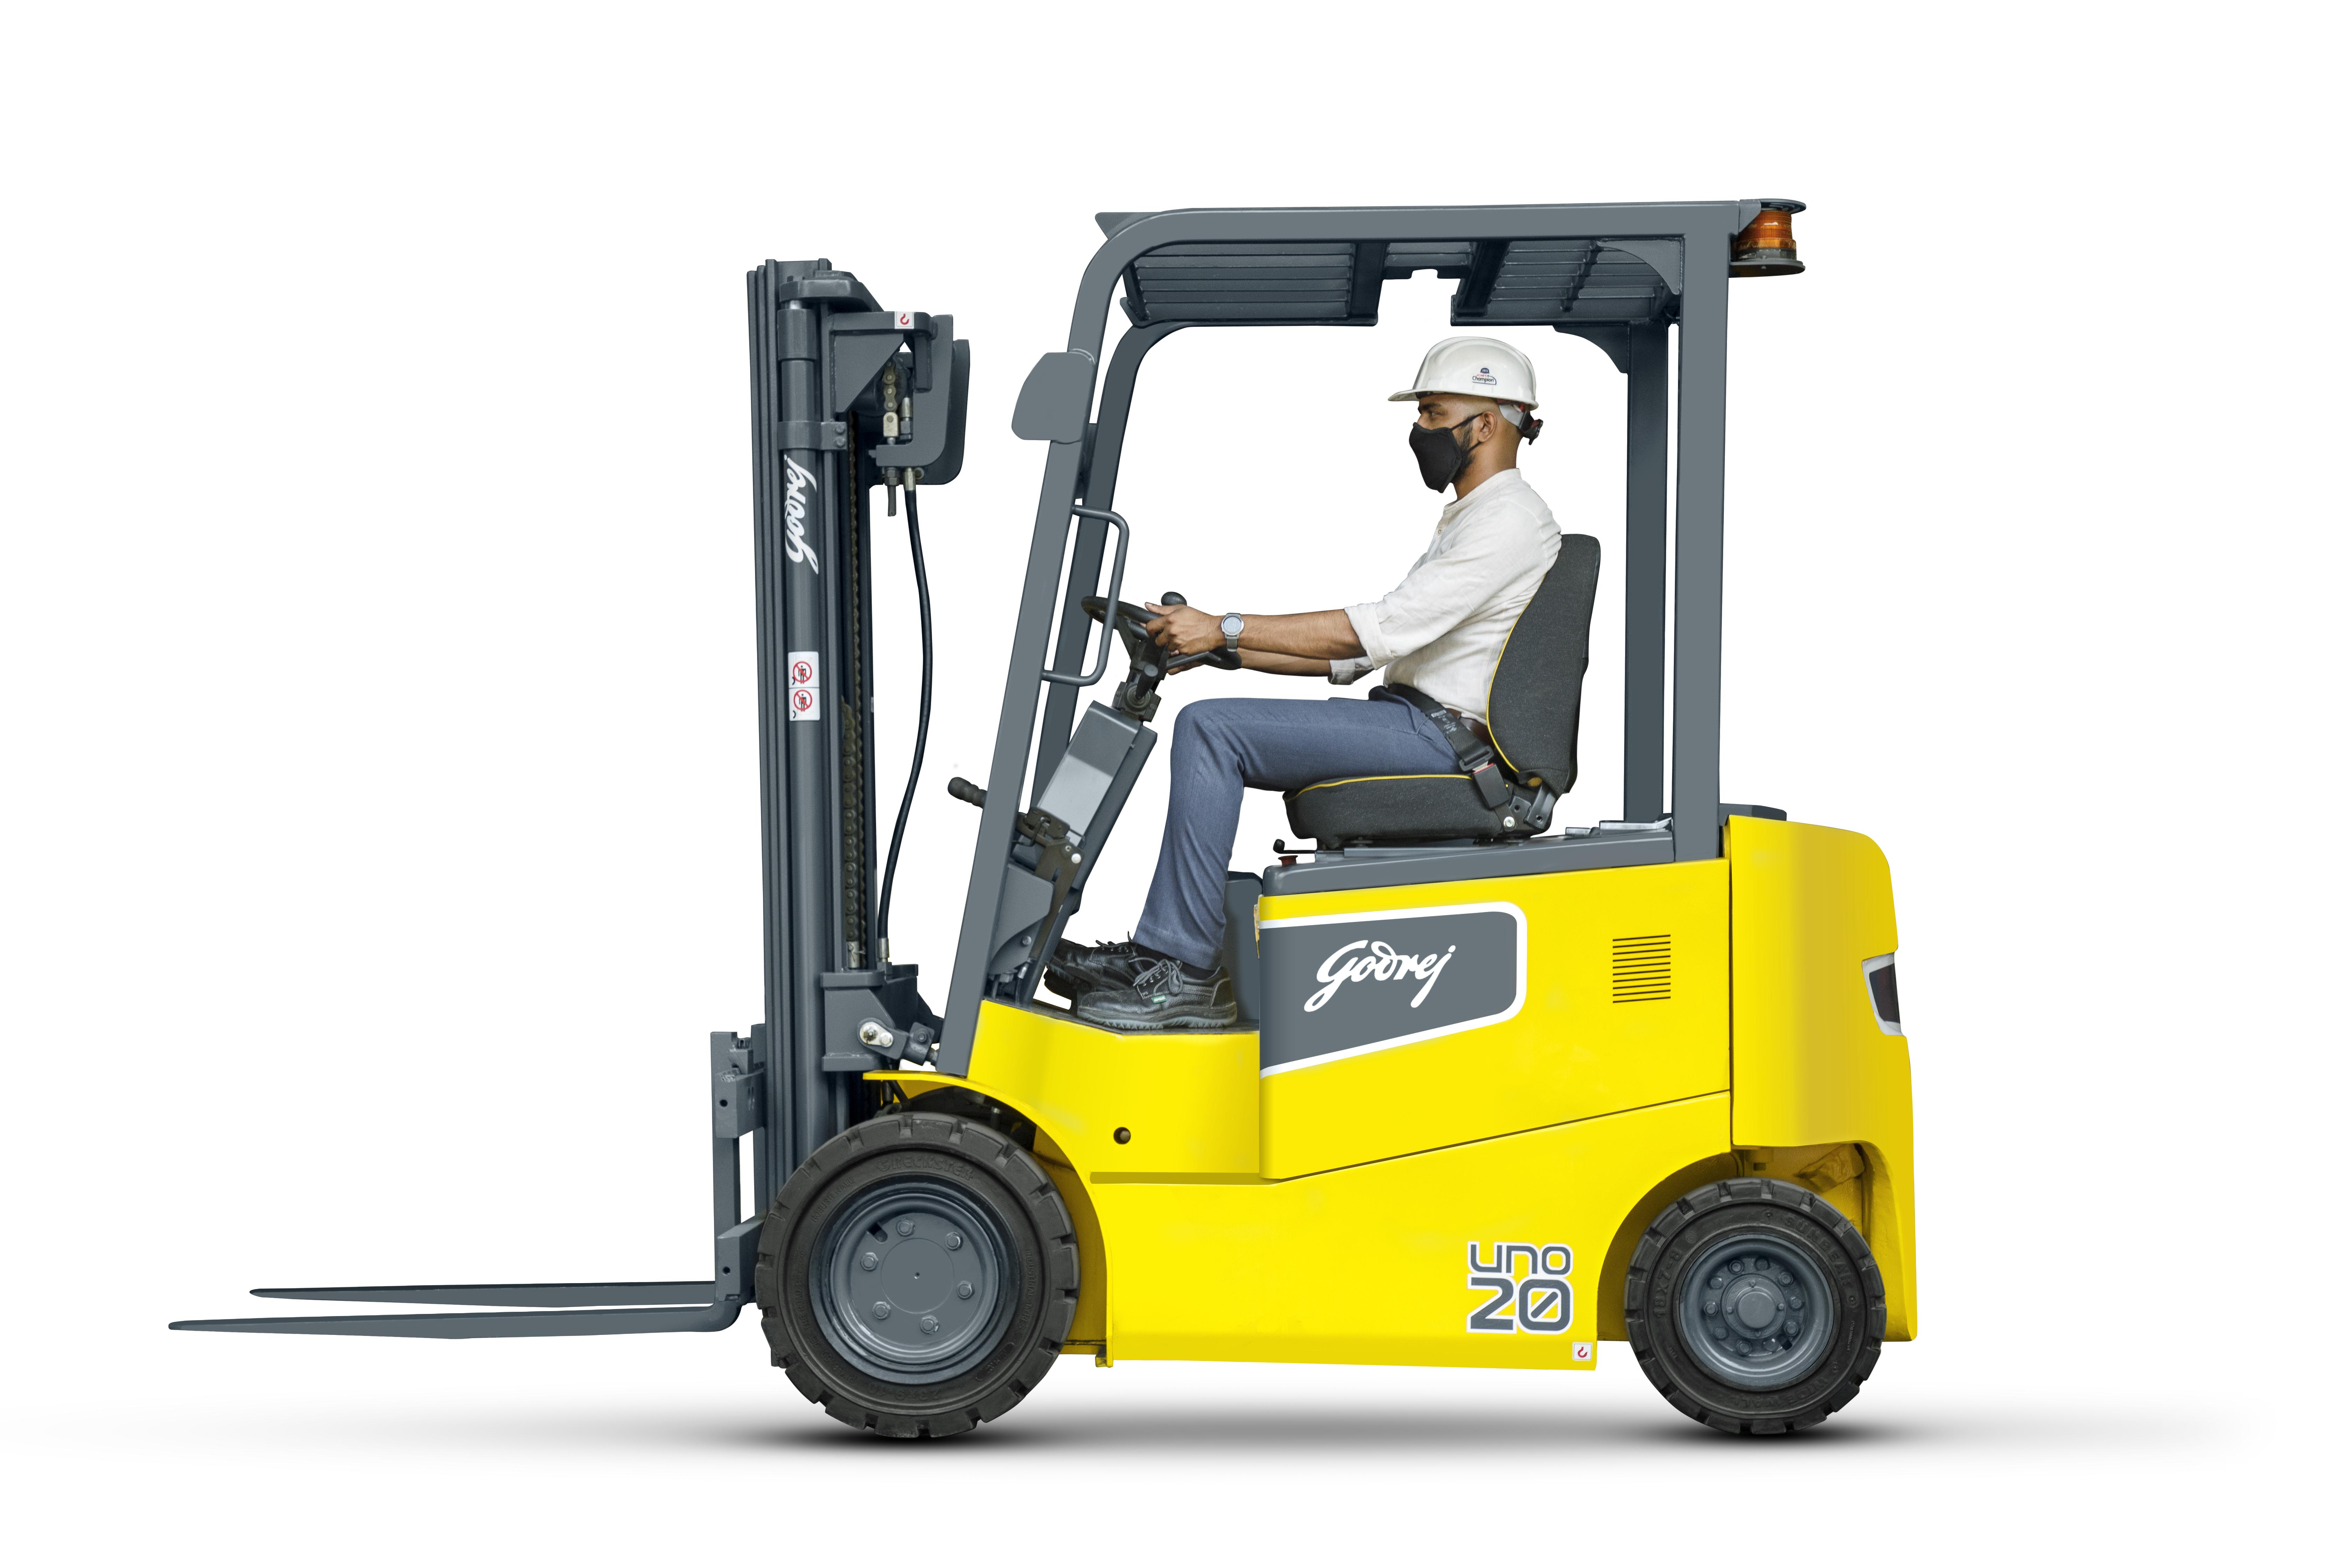 godrej UNO Forklift